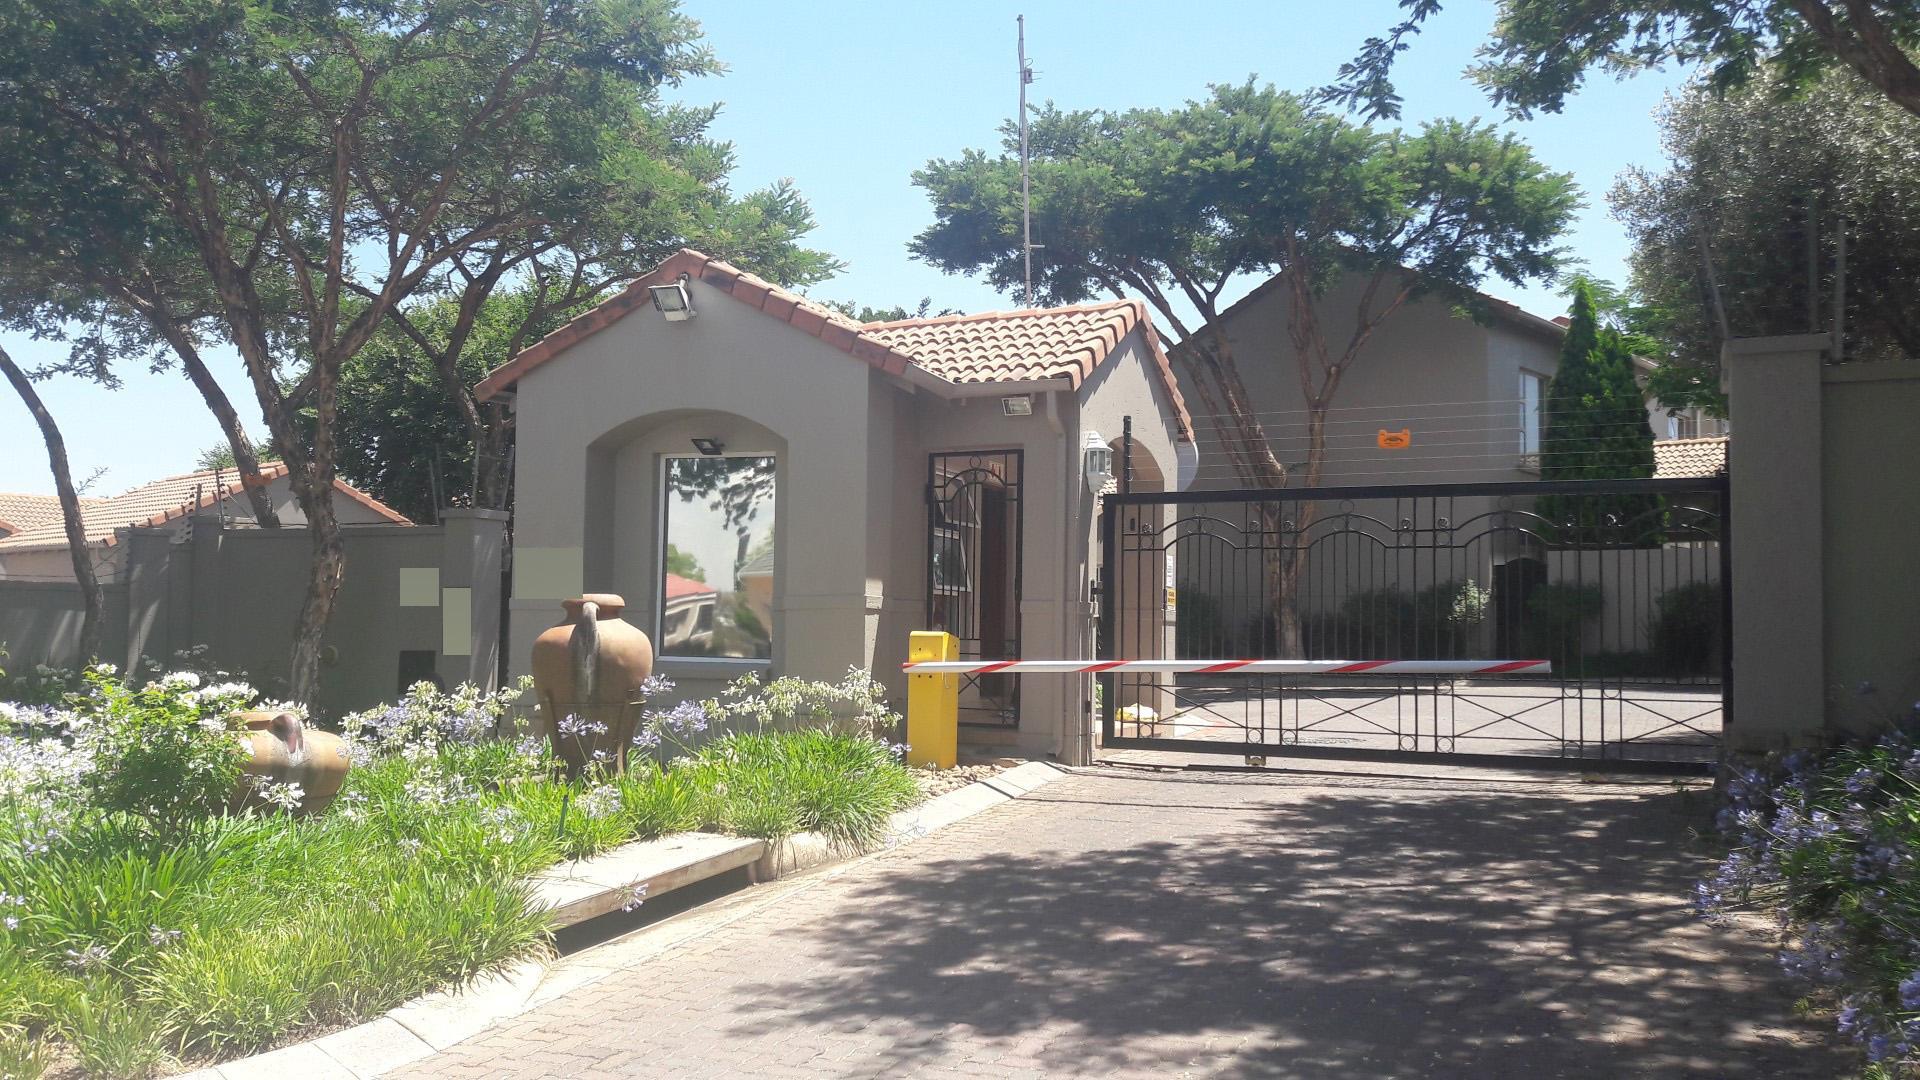 MR262899 - Gallo Manor, Gallo Manor, Johannesburg - Central North, Gauteng